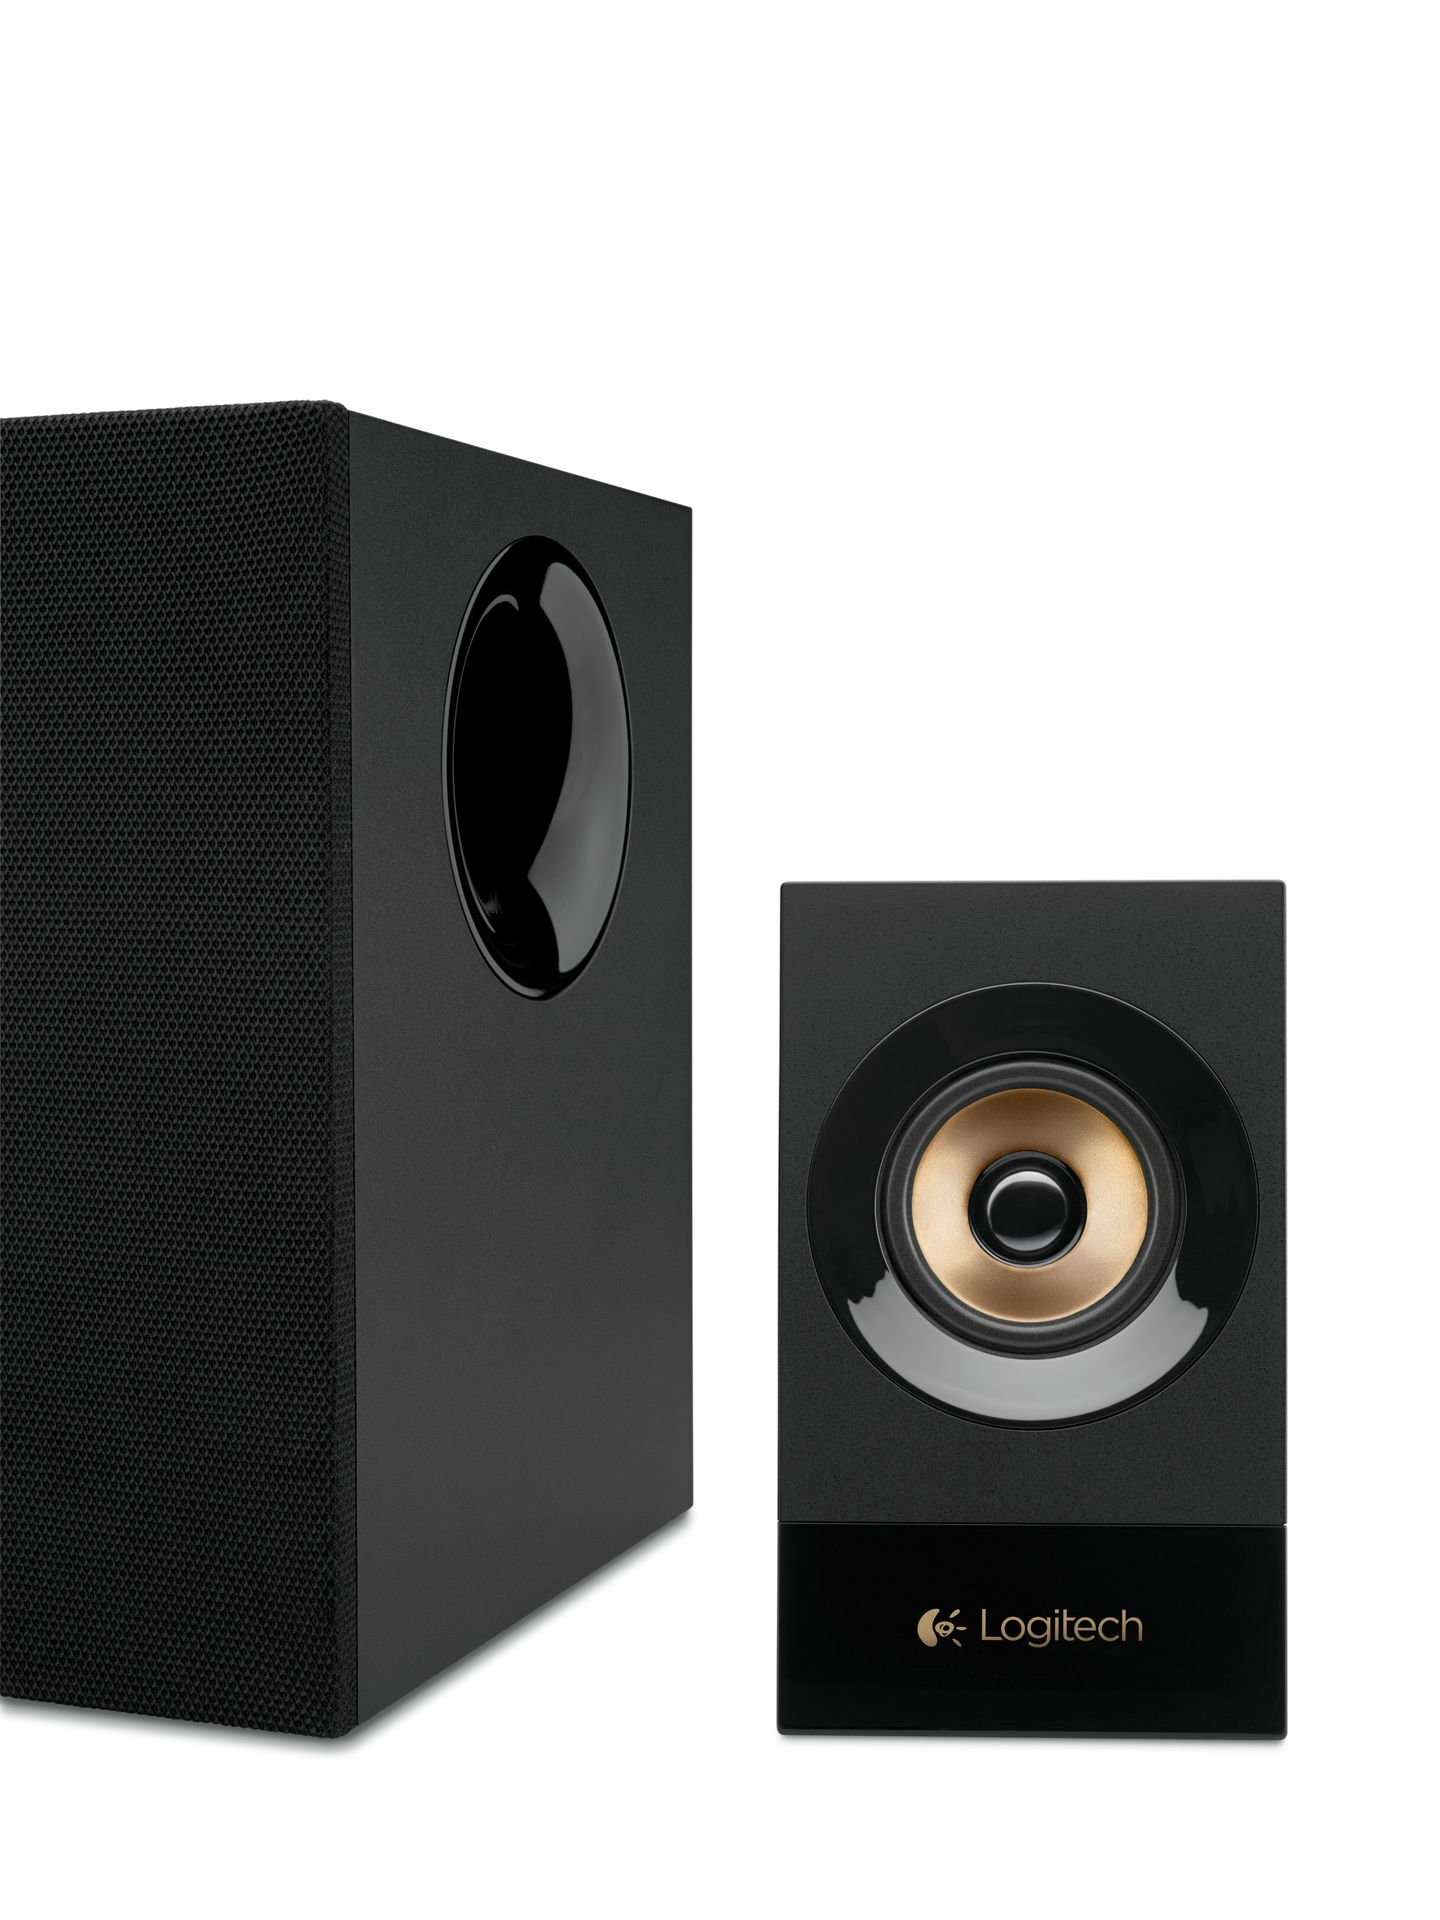 Logitech announces affordable z533 Multimedia Speakers